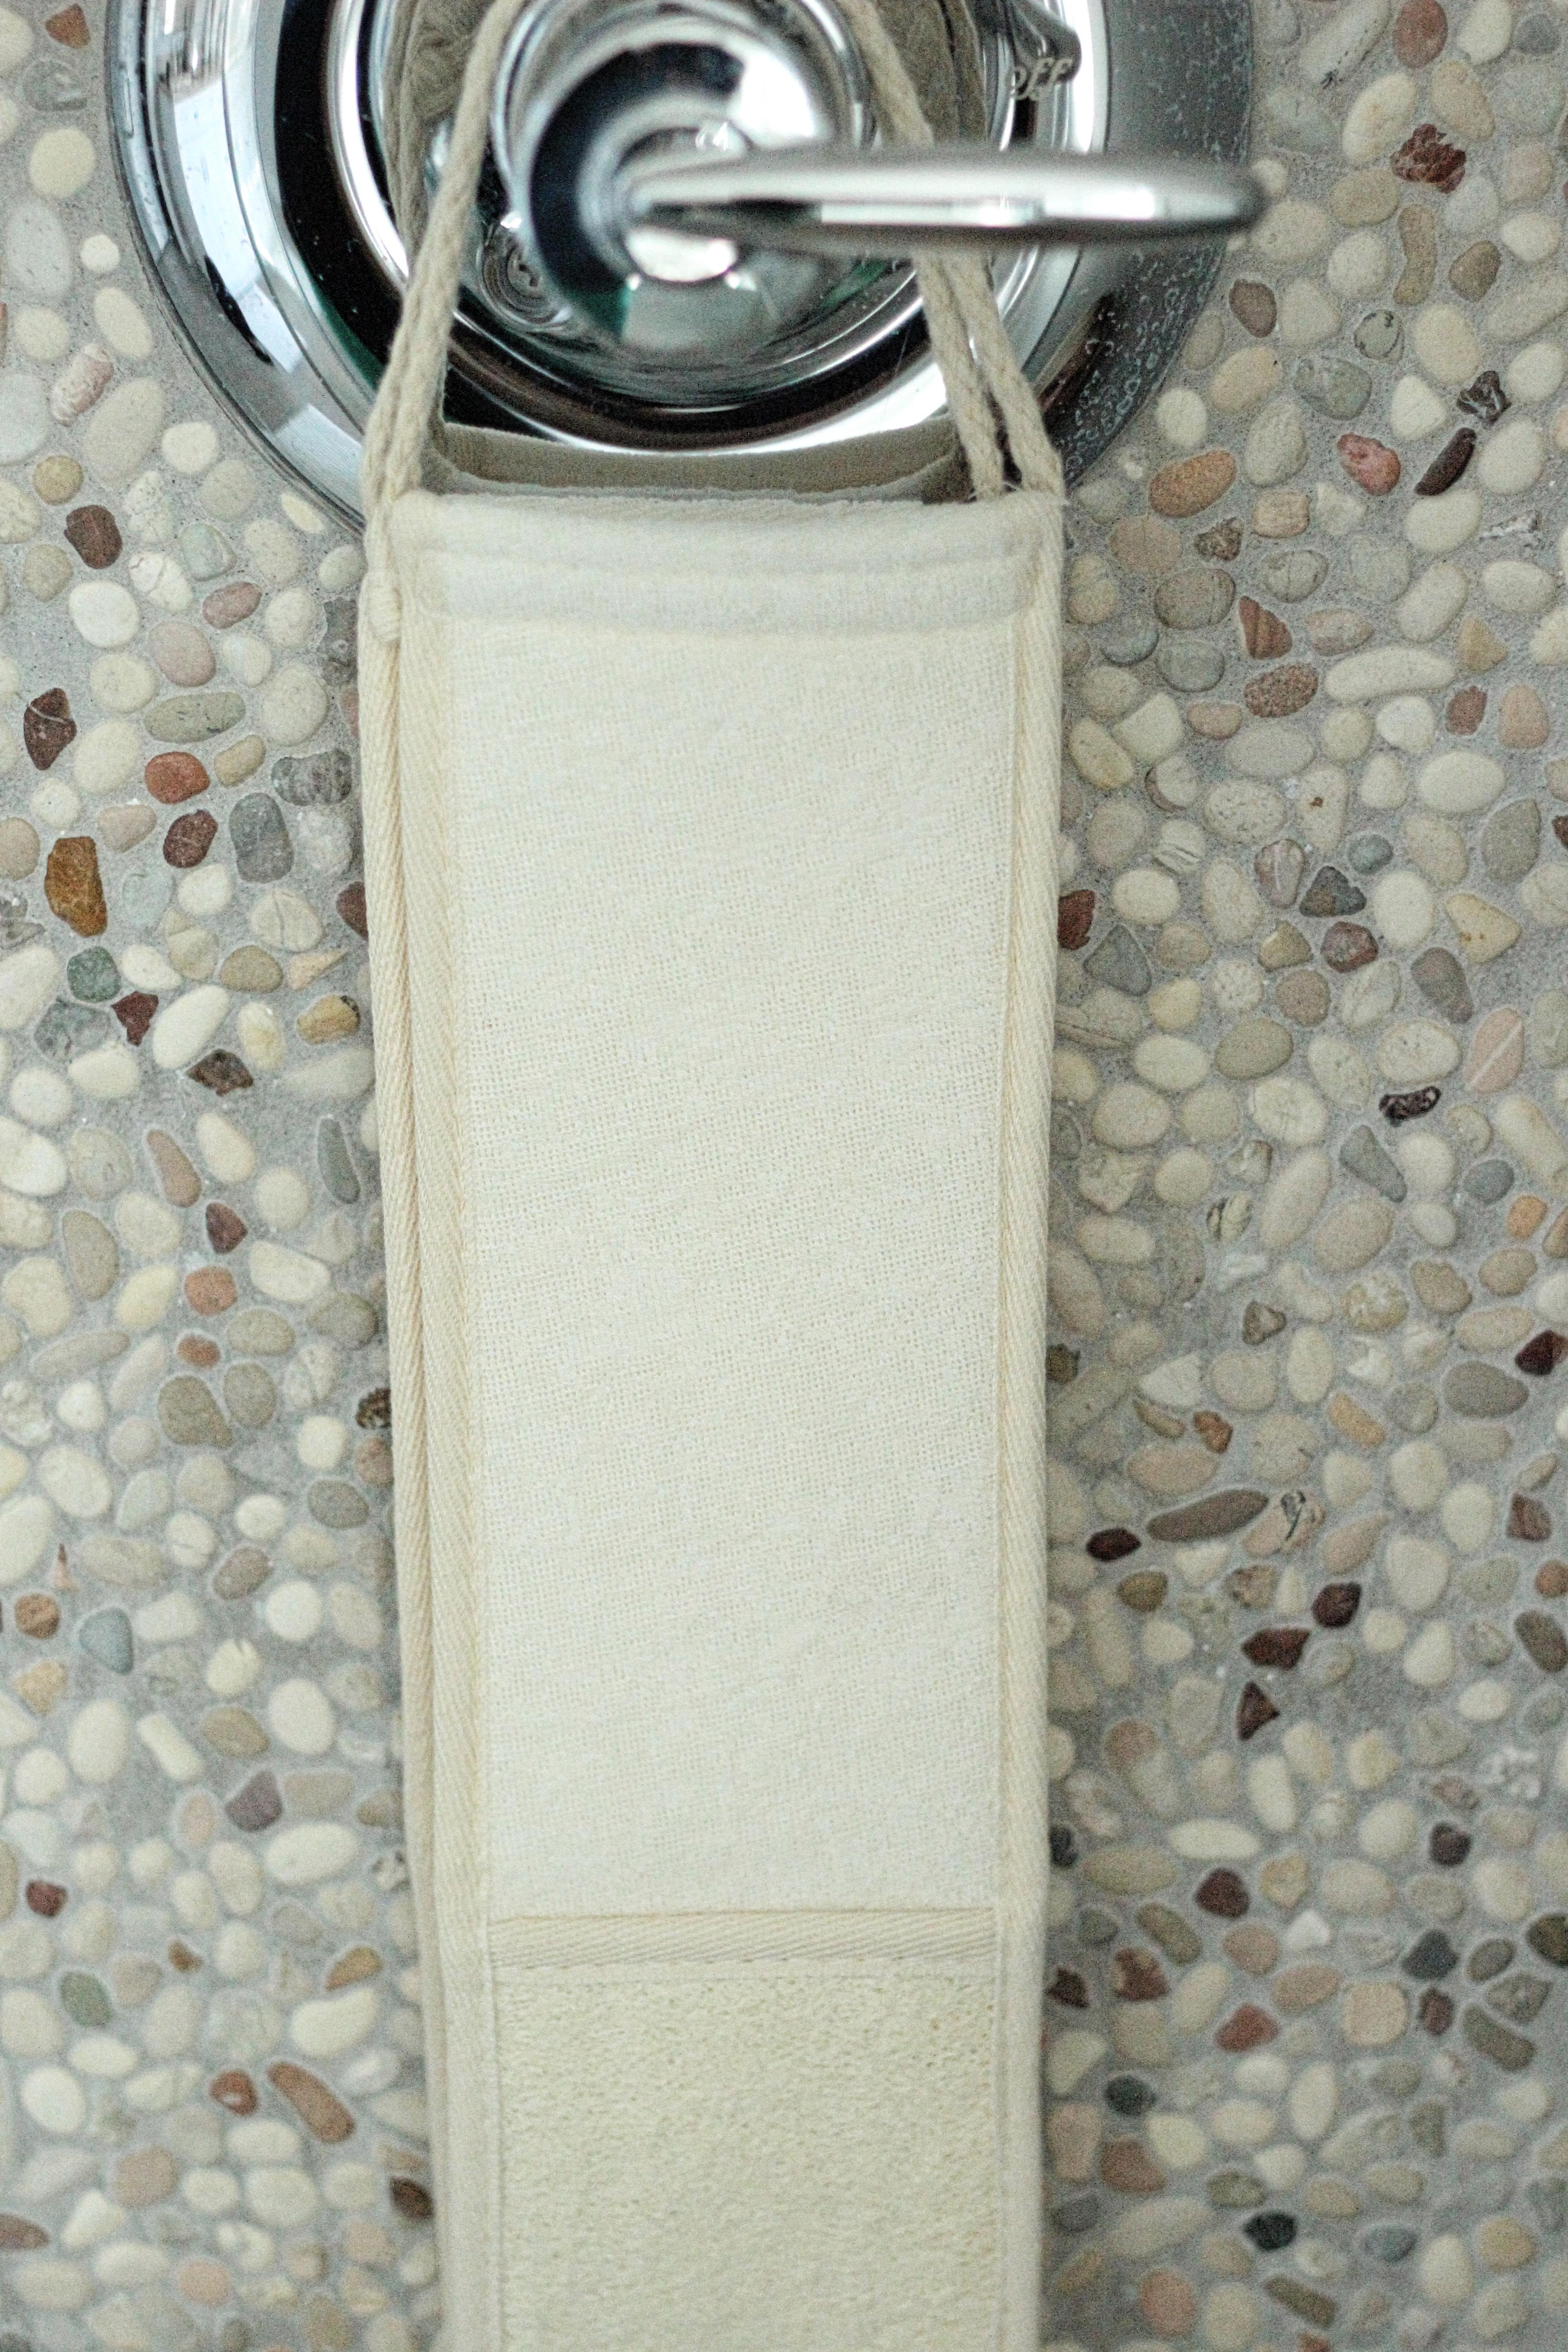 Luffa scrubber hanging in shower